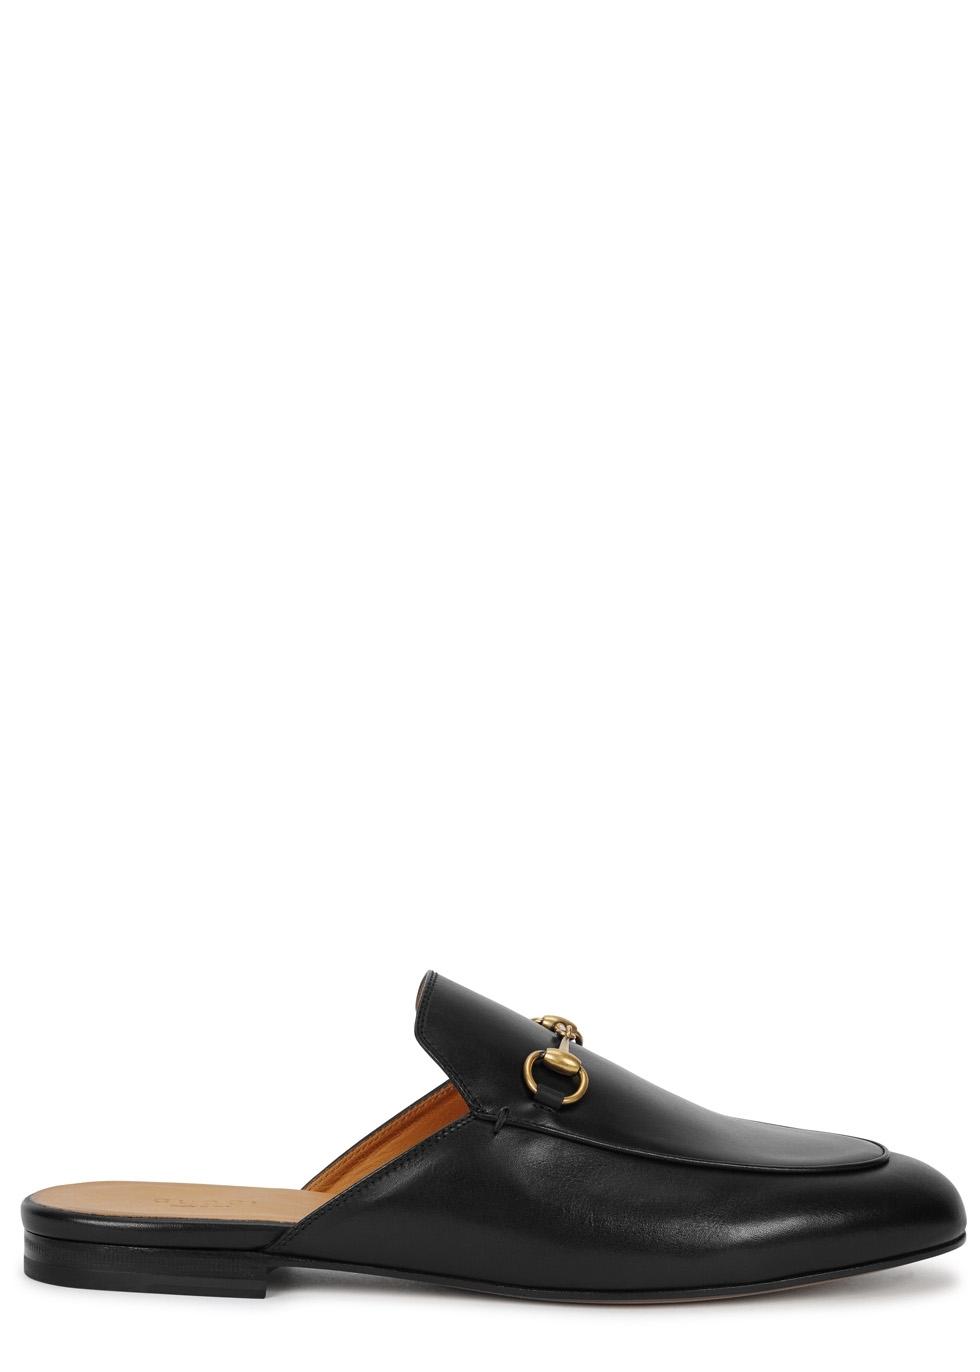 Womens Designer Flats Flat Shoes Harvey Nichols D Island Slip On Mocasine Casual Brown